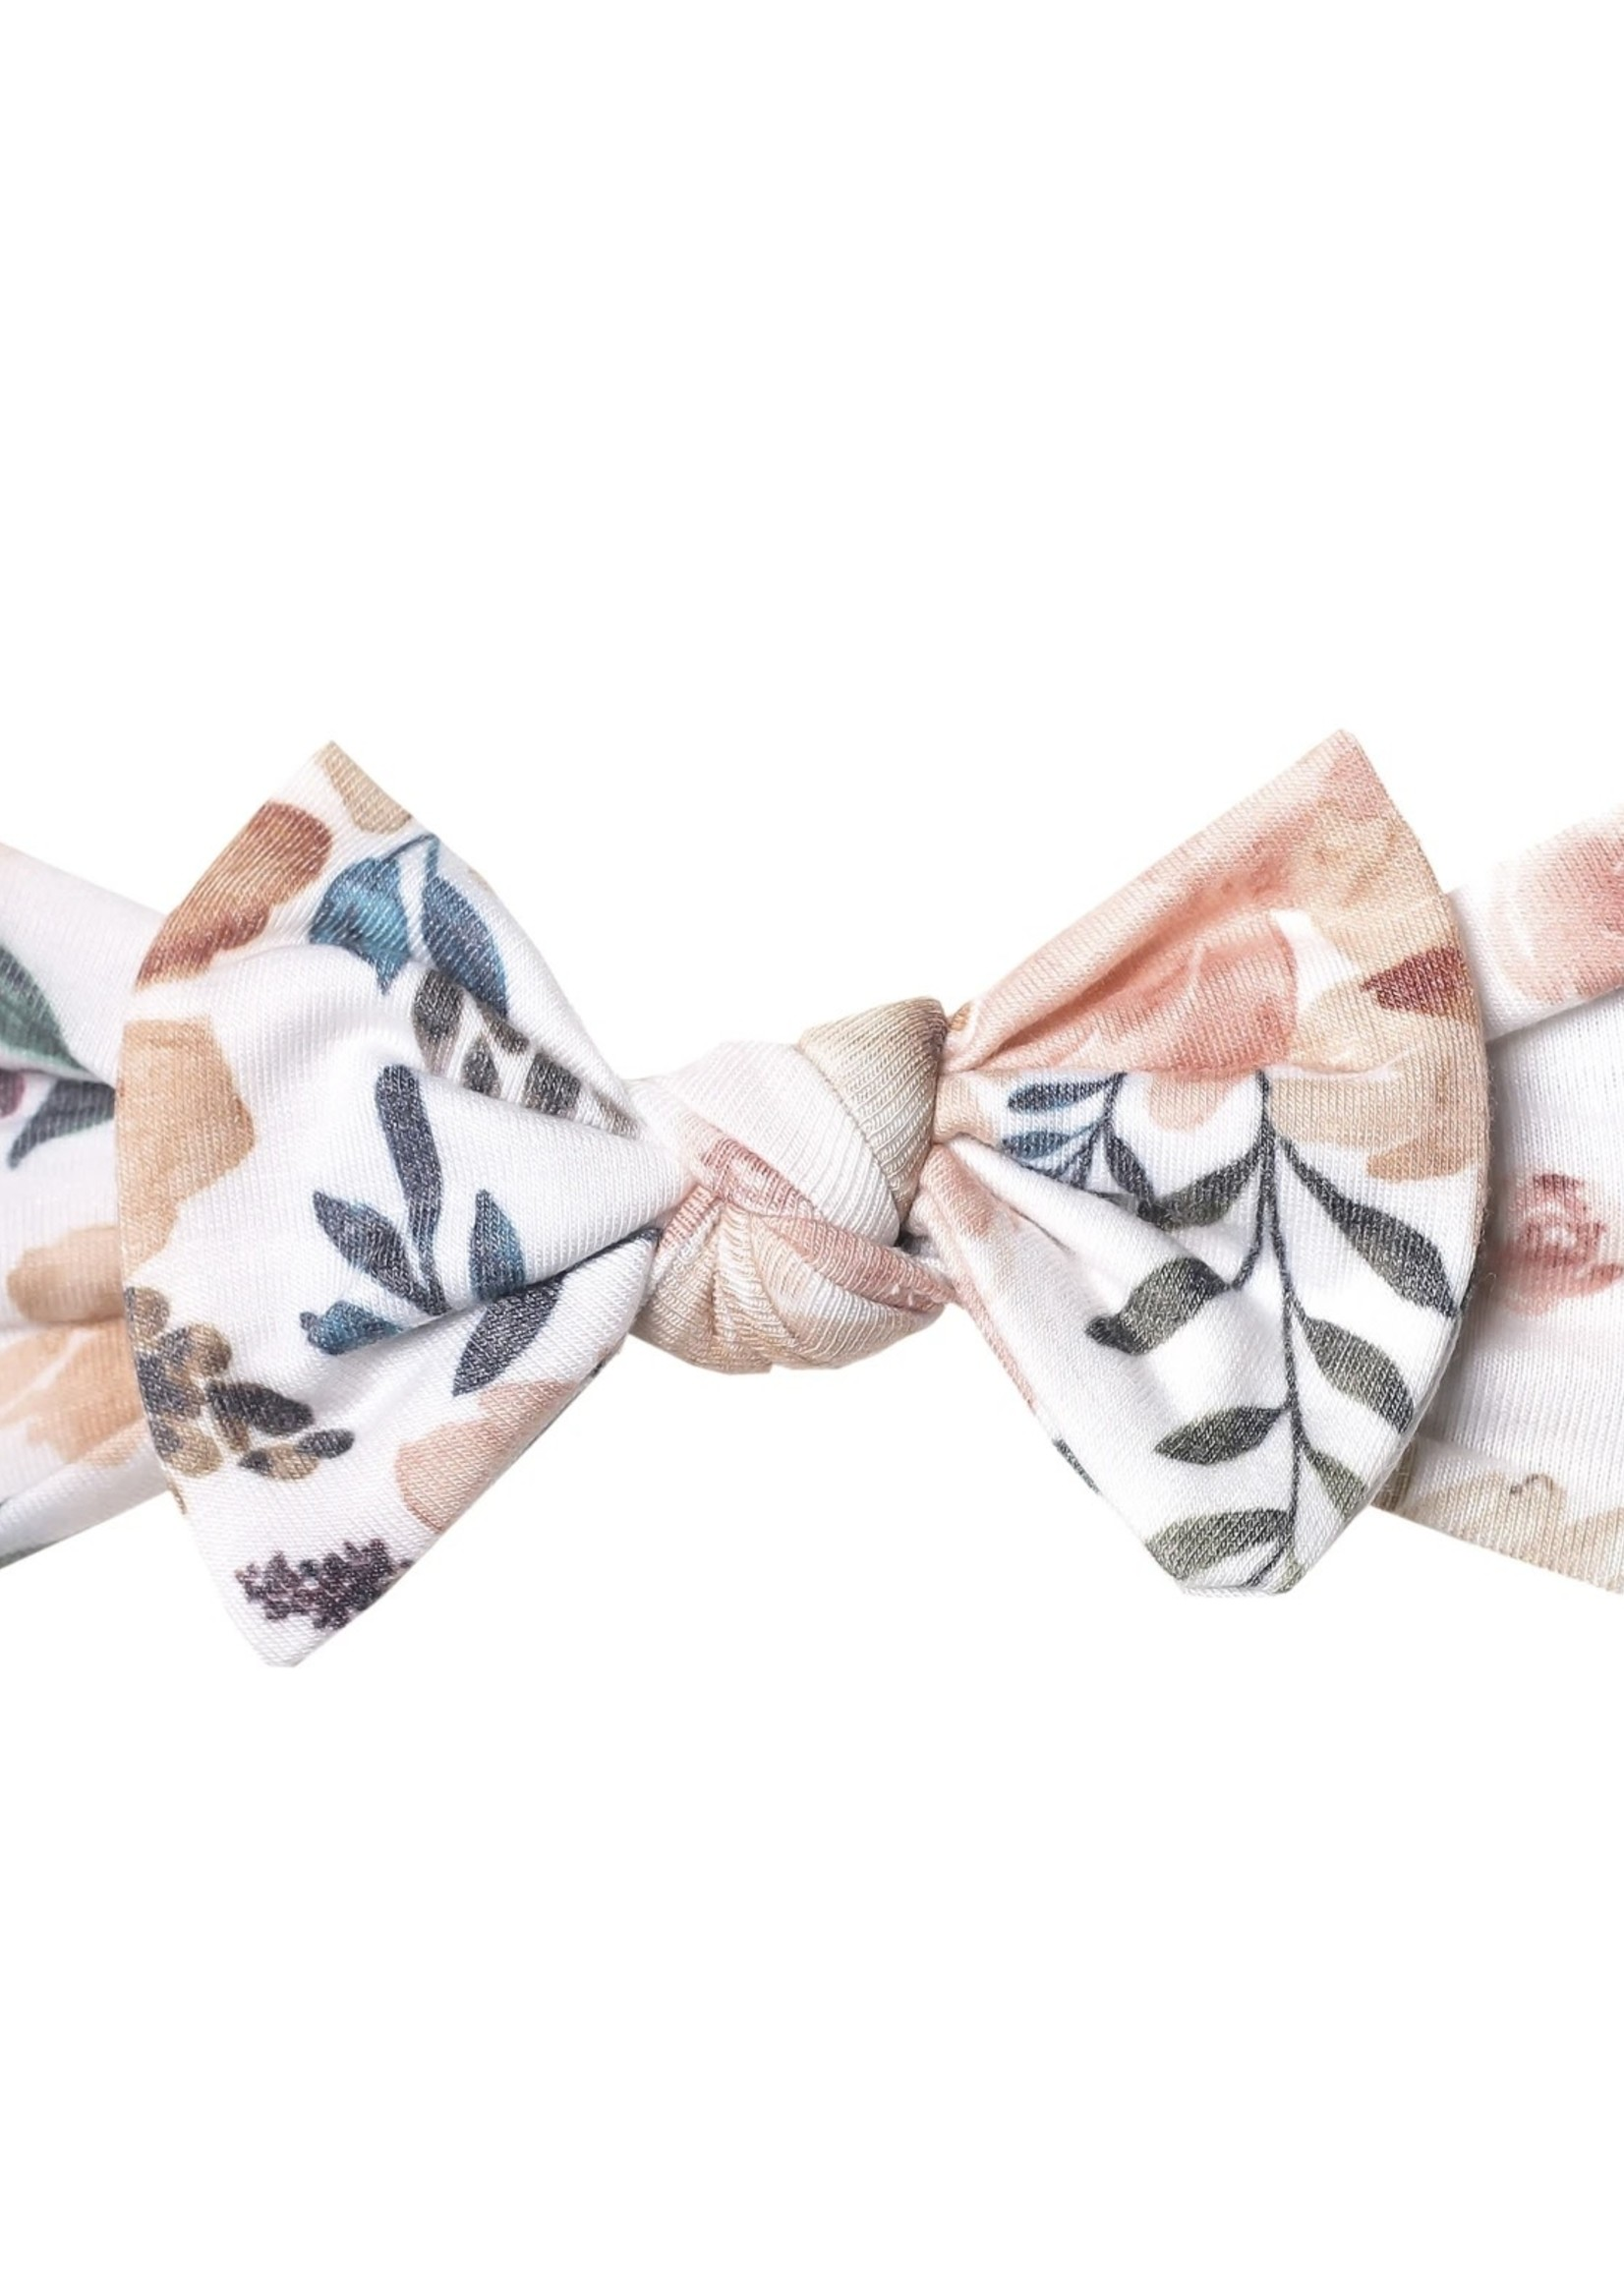 COPPER PEARL Knit Headband Bow AUTUMN